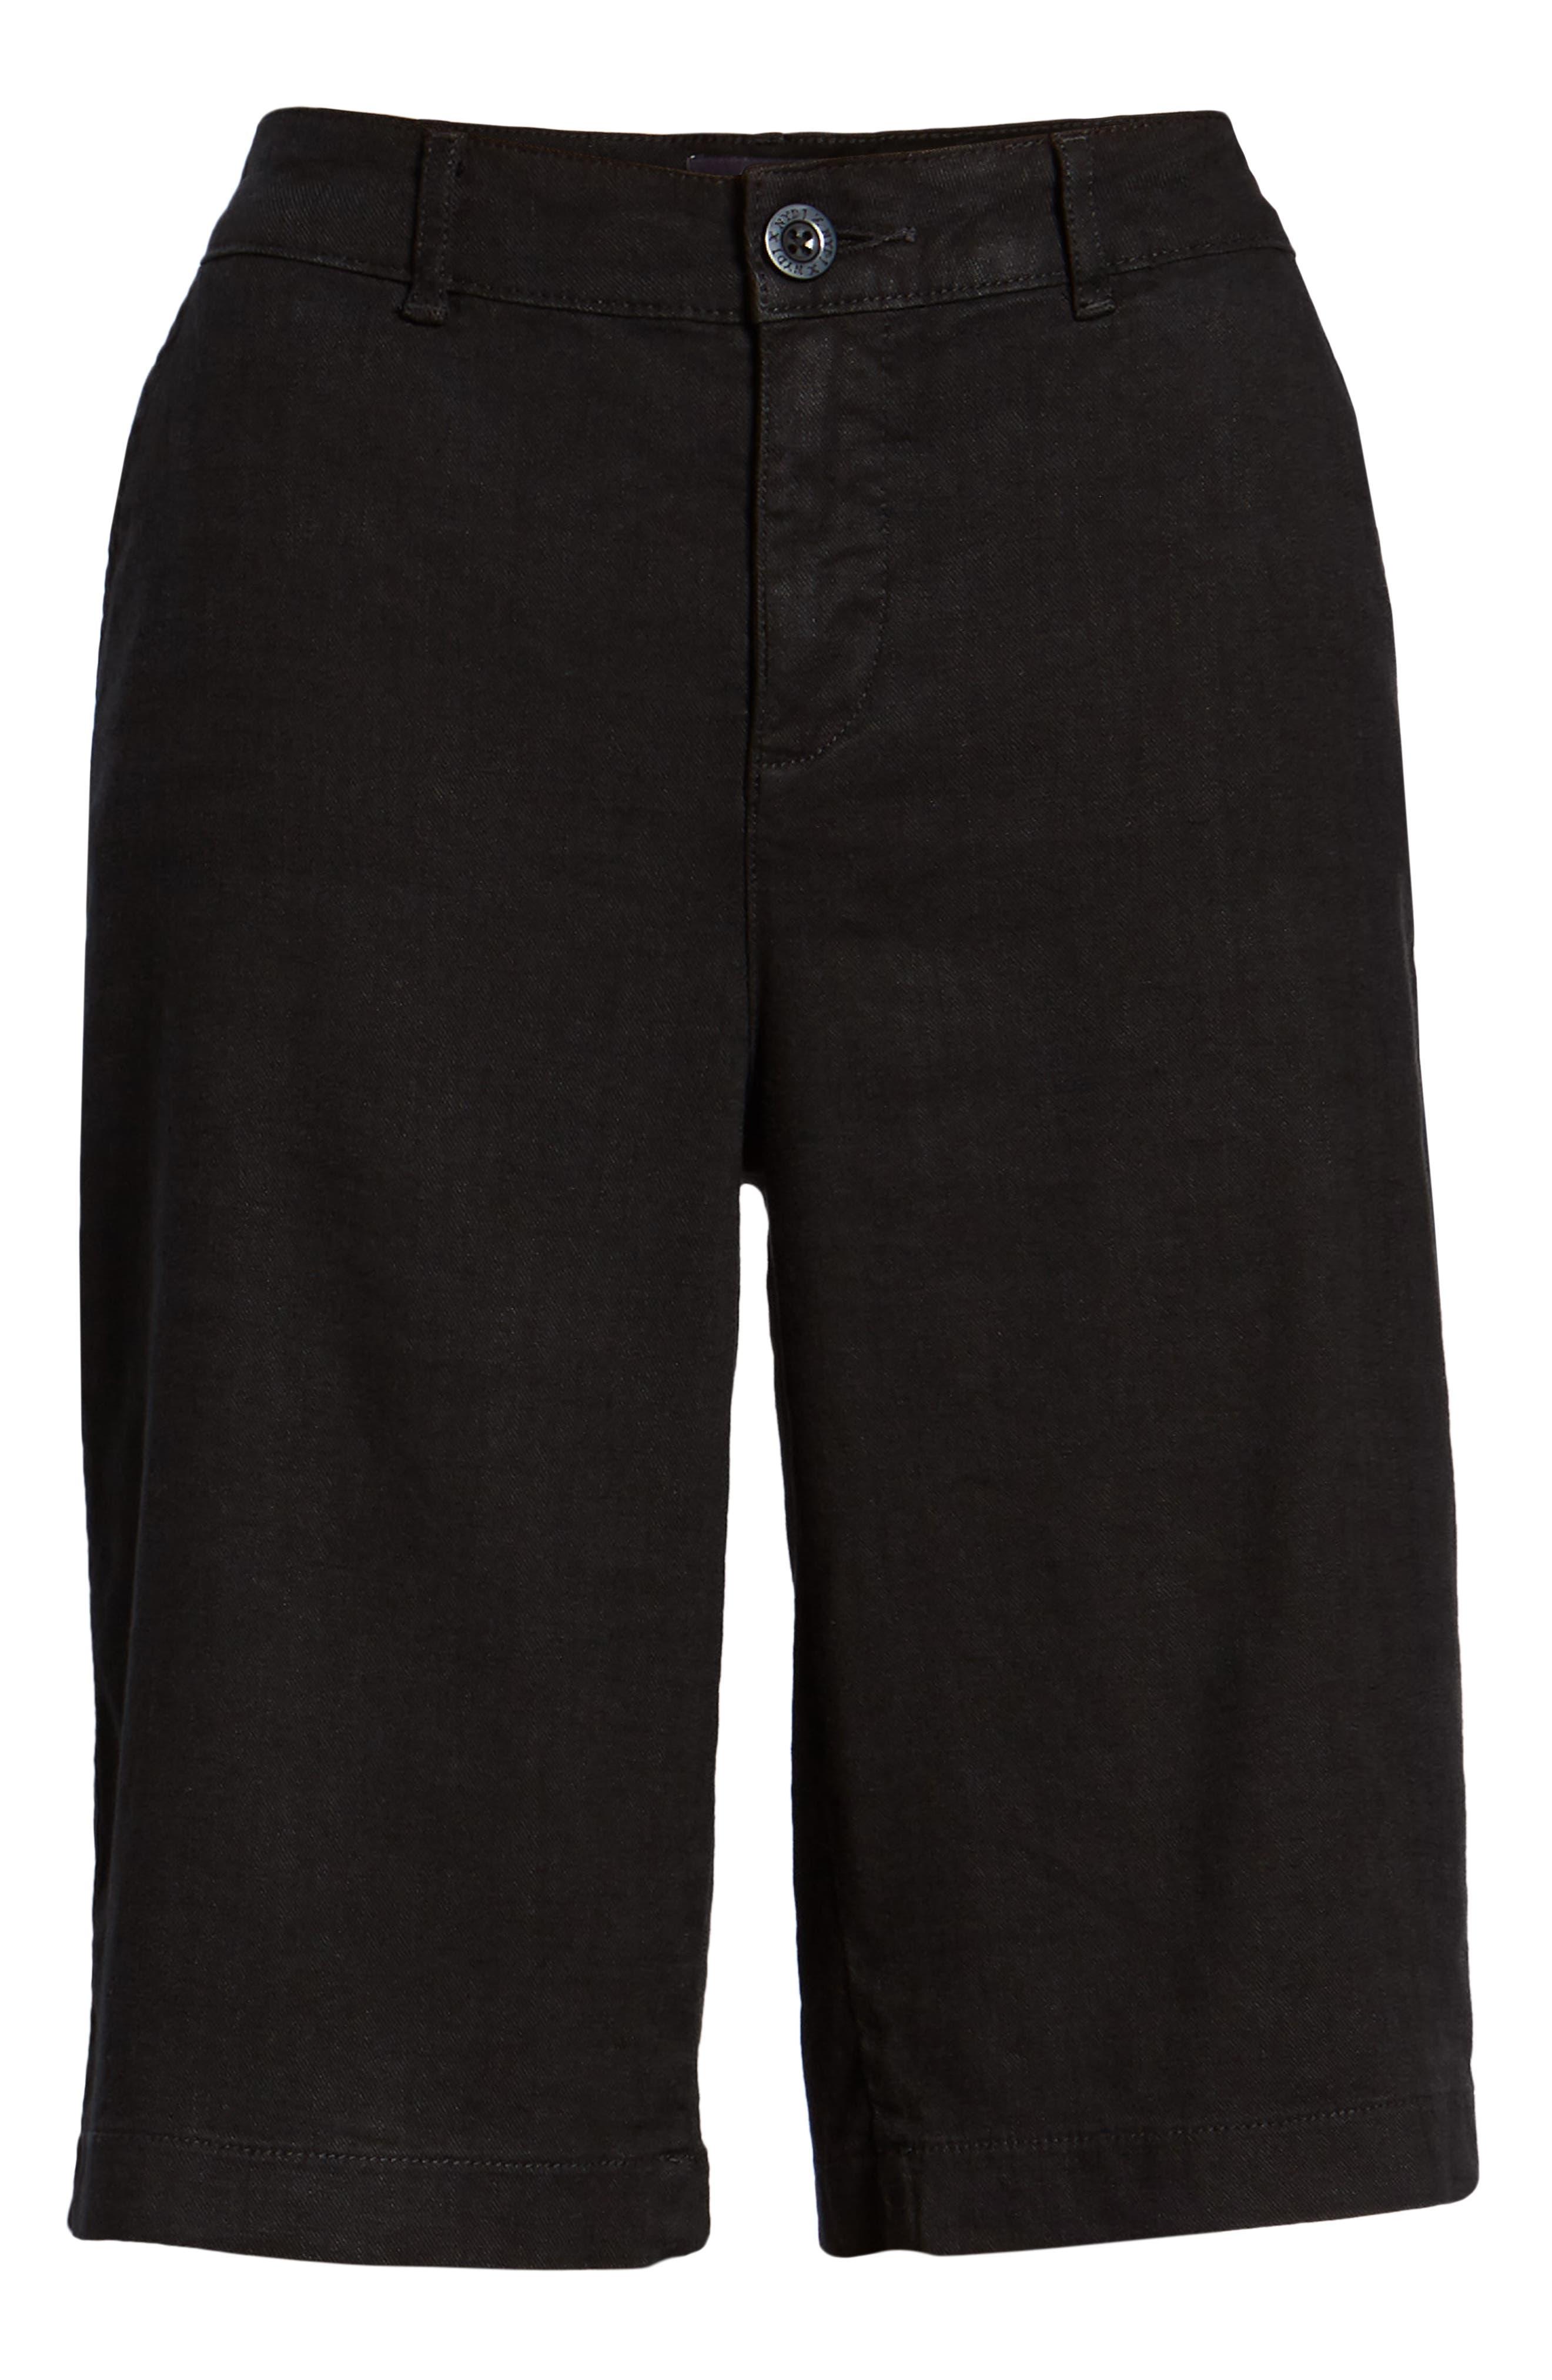 Stretch Linen Blend Bermuda Shorts,                             Alternate thumbnail 6, color,                             001